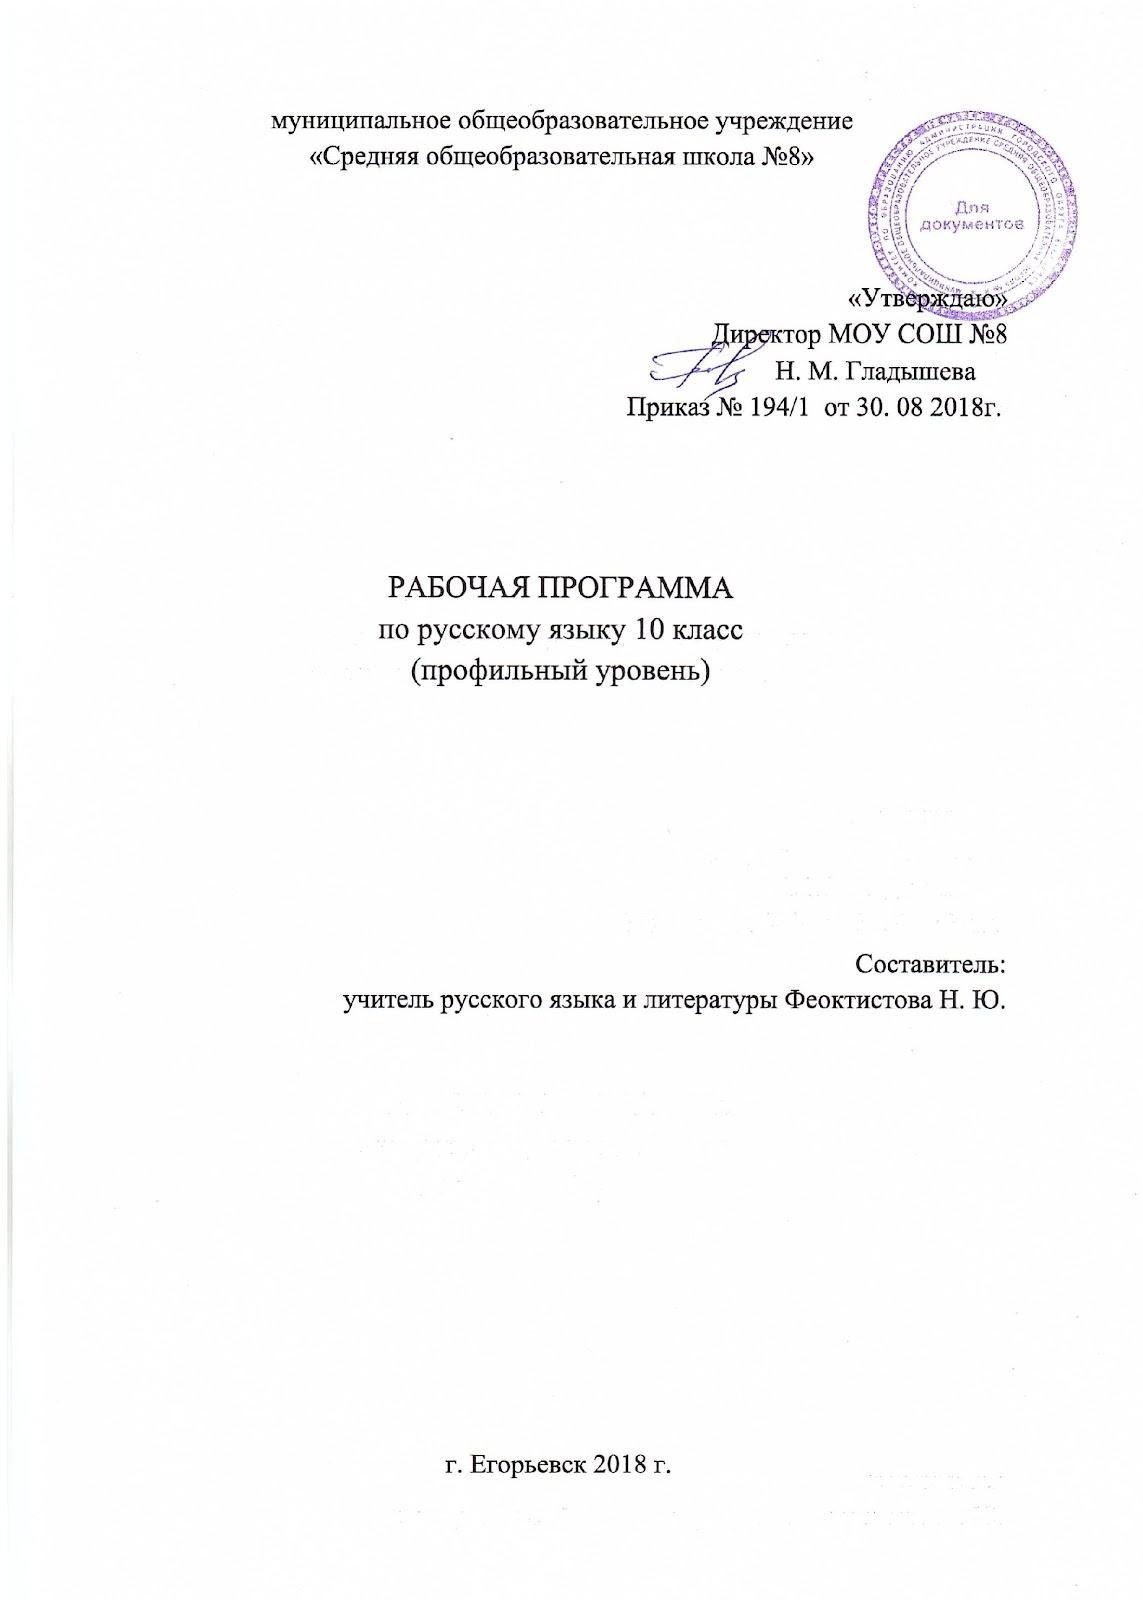 C:\Documents and Settings\Администратор\Рабочий стол\154455-5.jpg